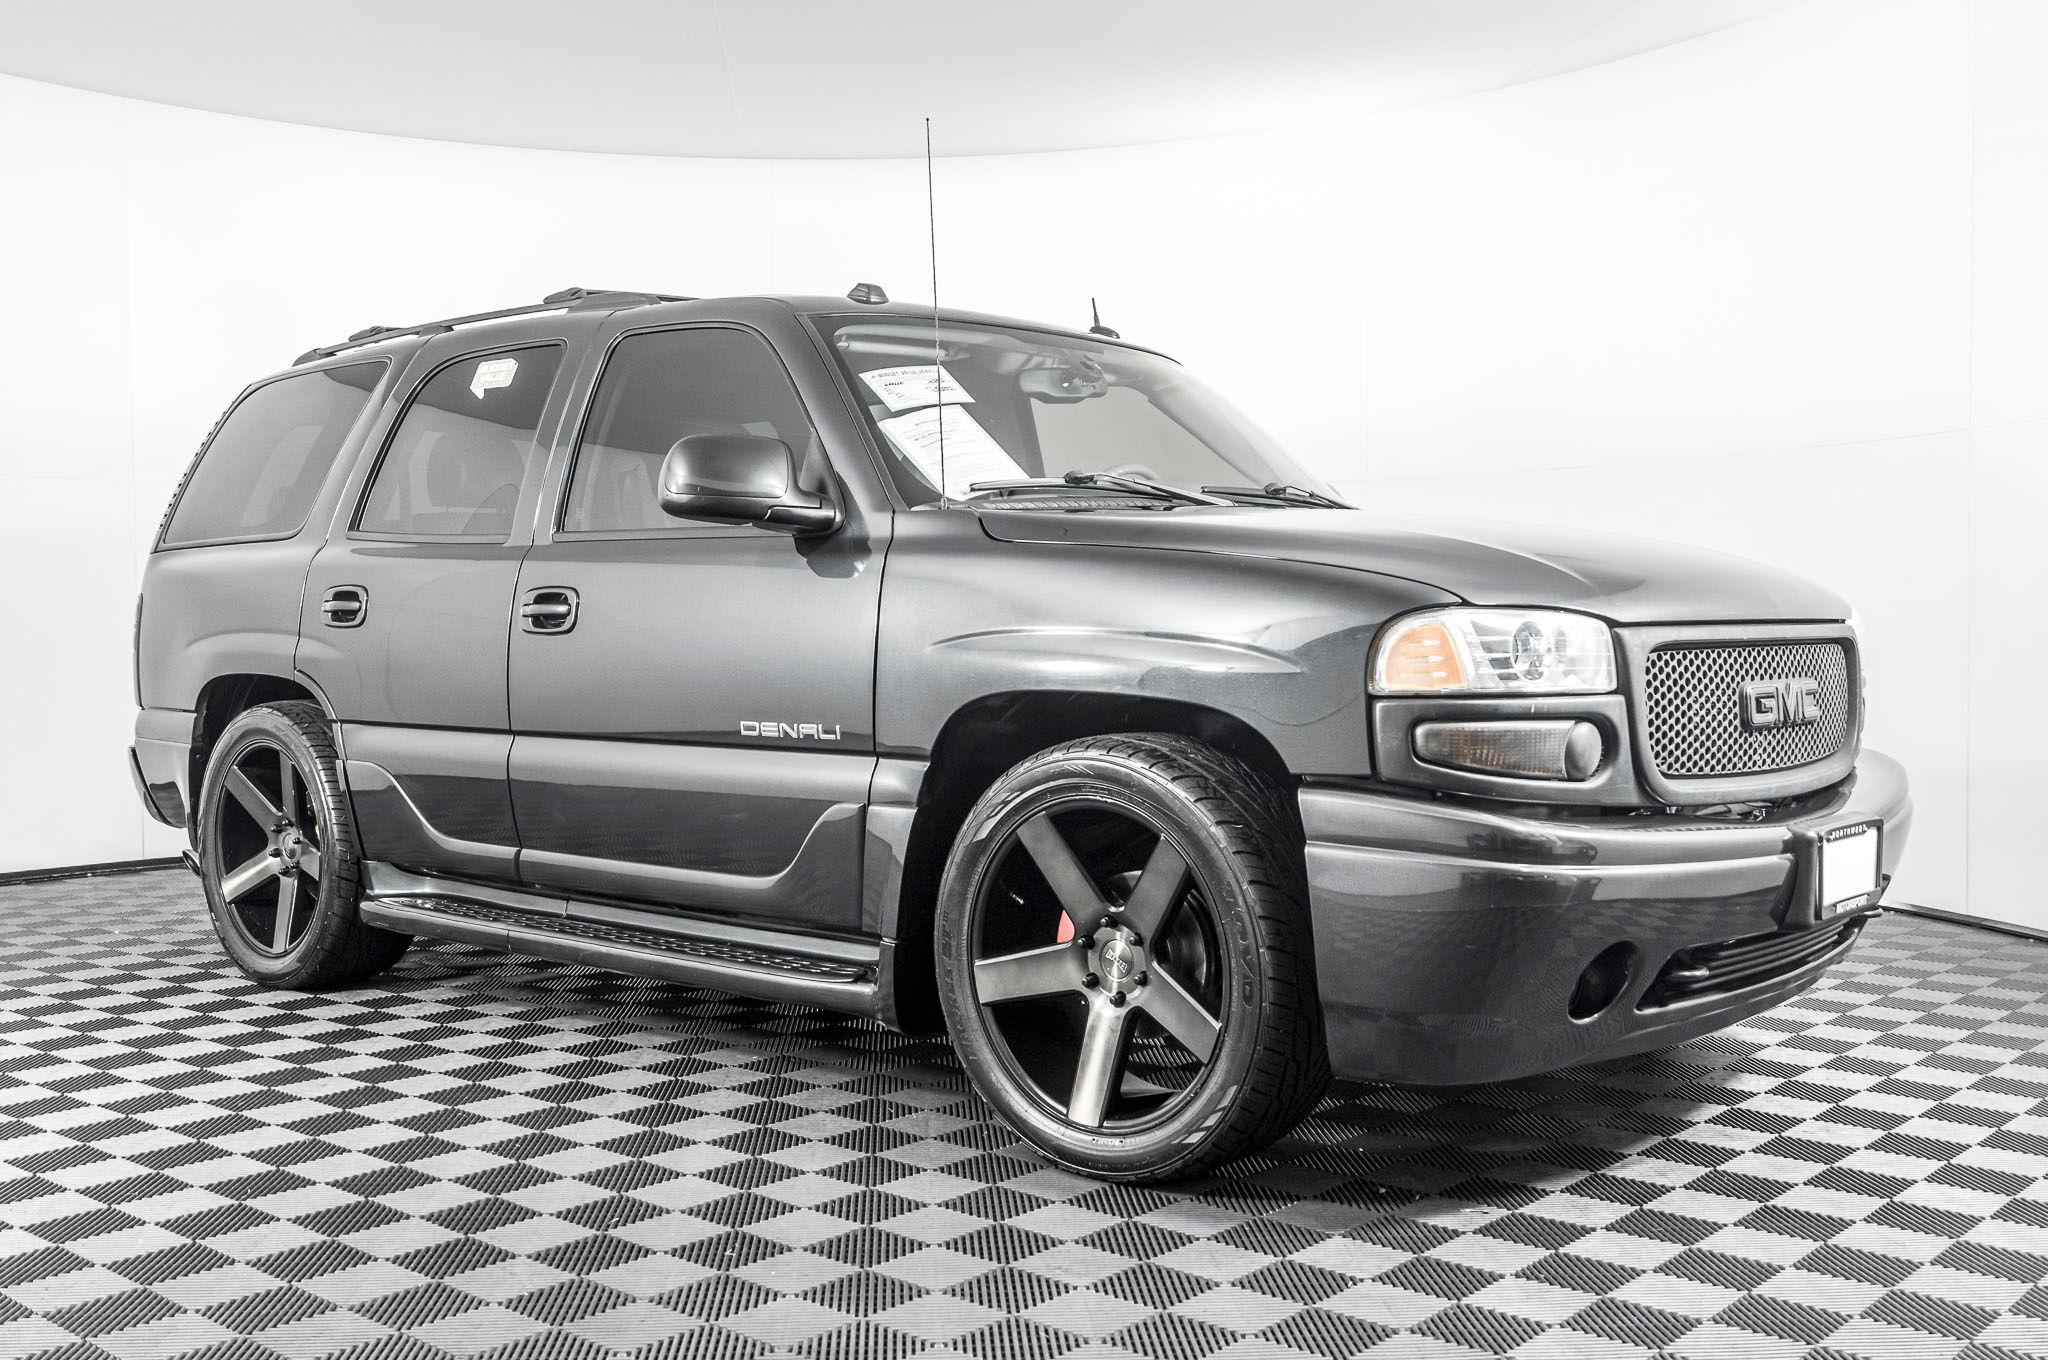 Used 2004 Gmc Yukon Denali Awd Suv For Sale Northwest Motorsport